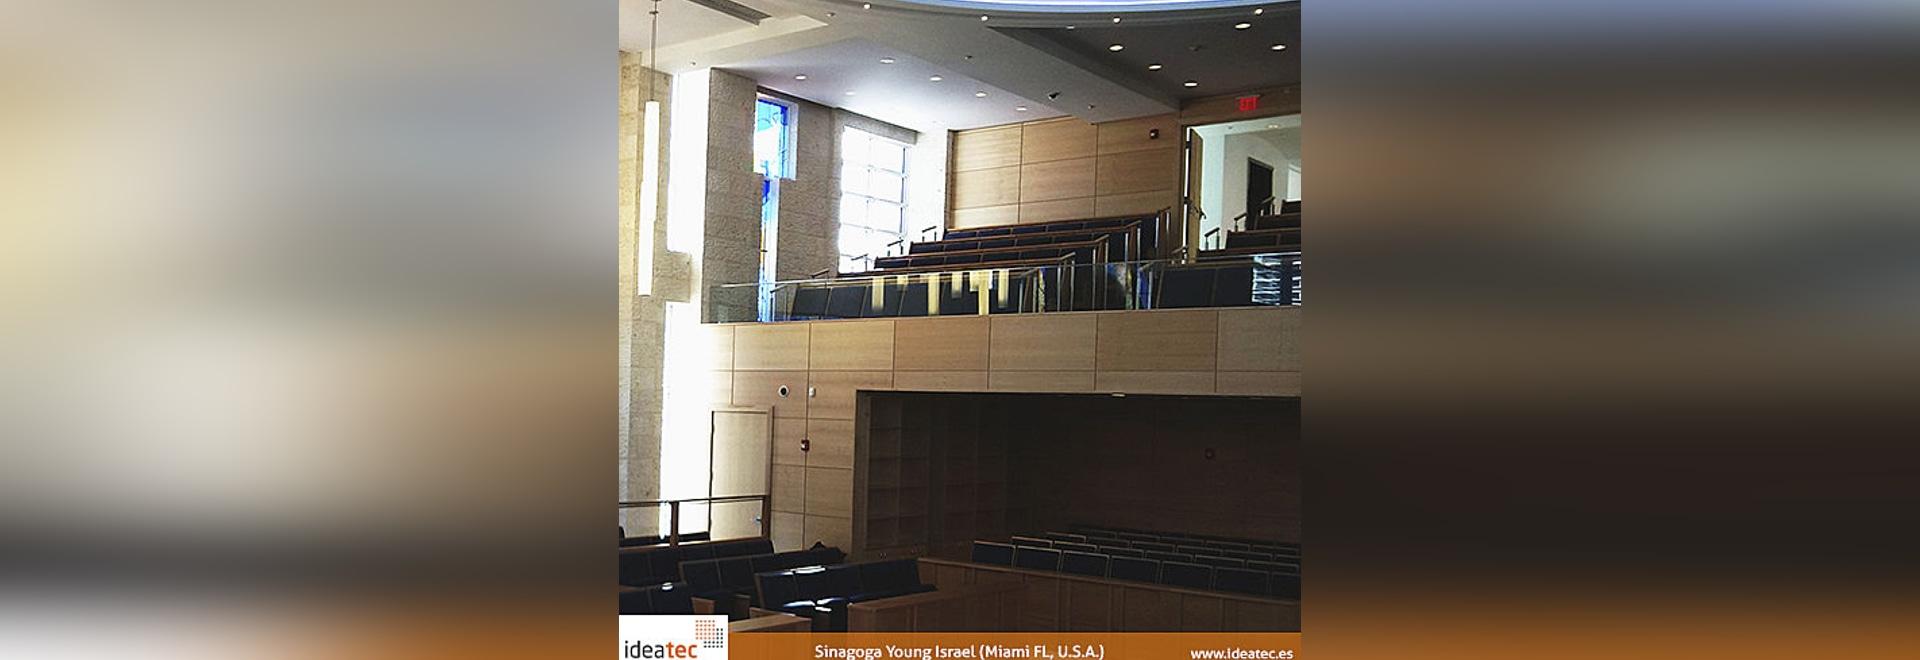 Sinagoga Young Israel, Miami FL (USA)